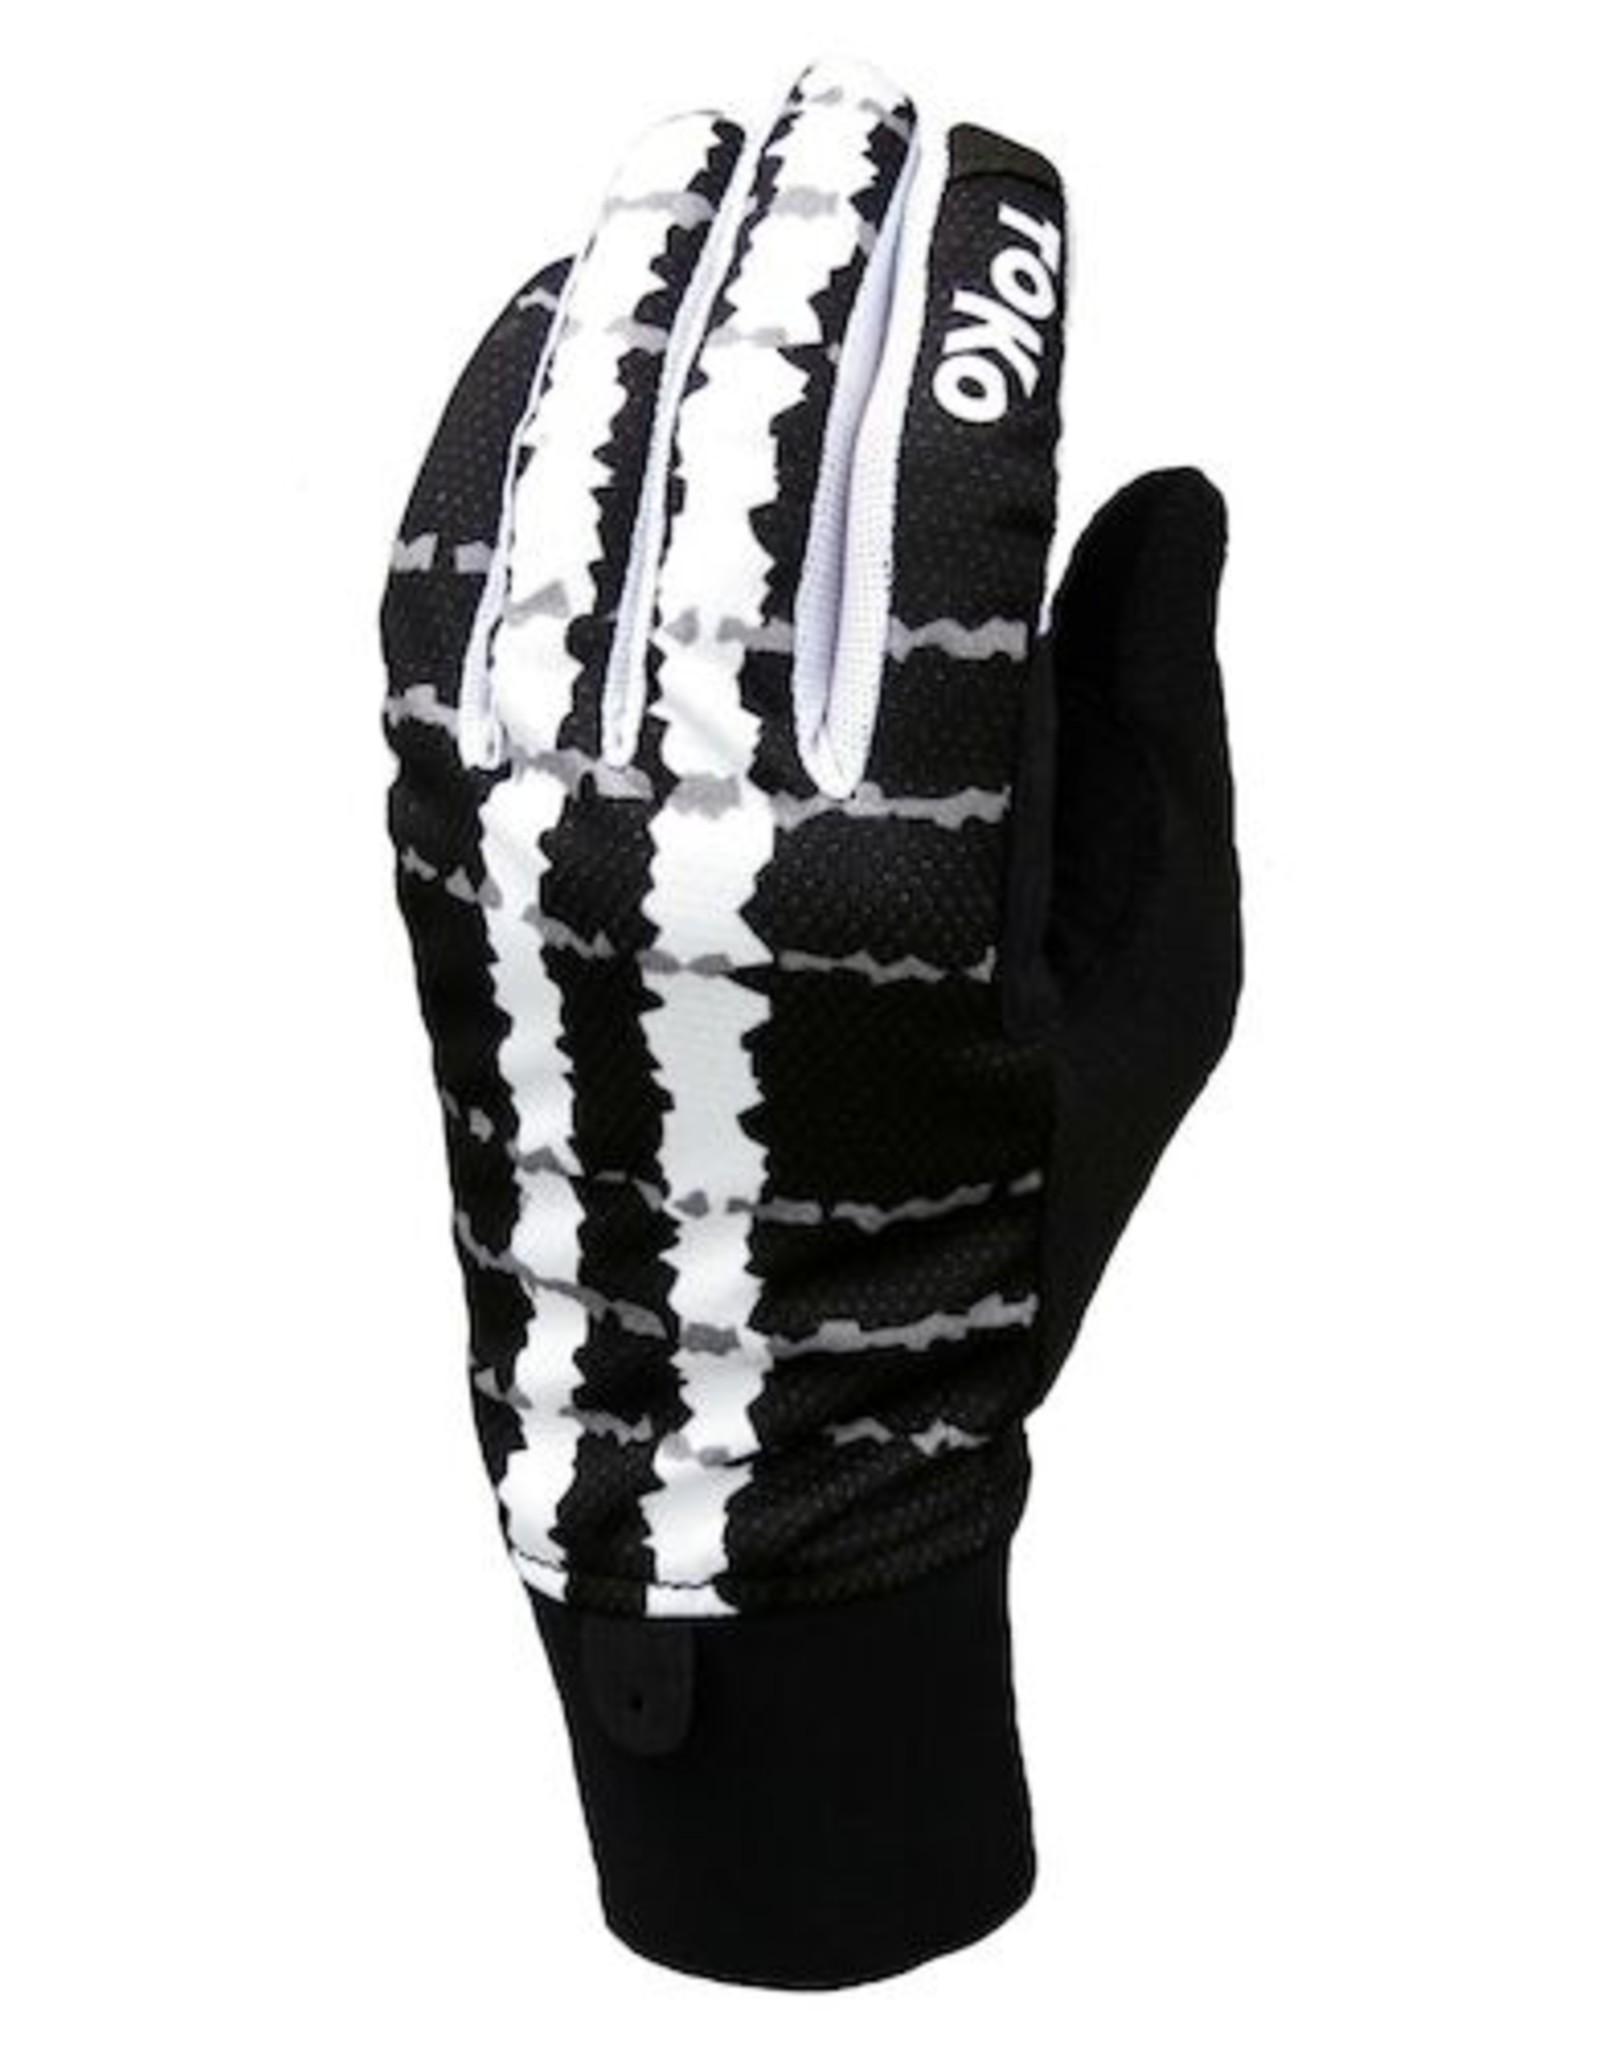 Toko Profi Glove